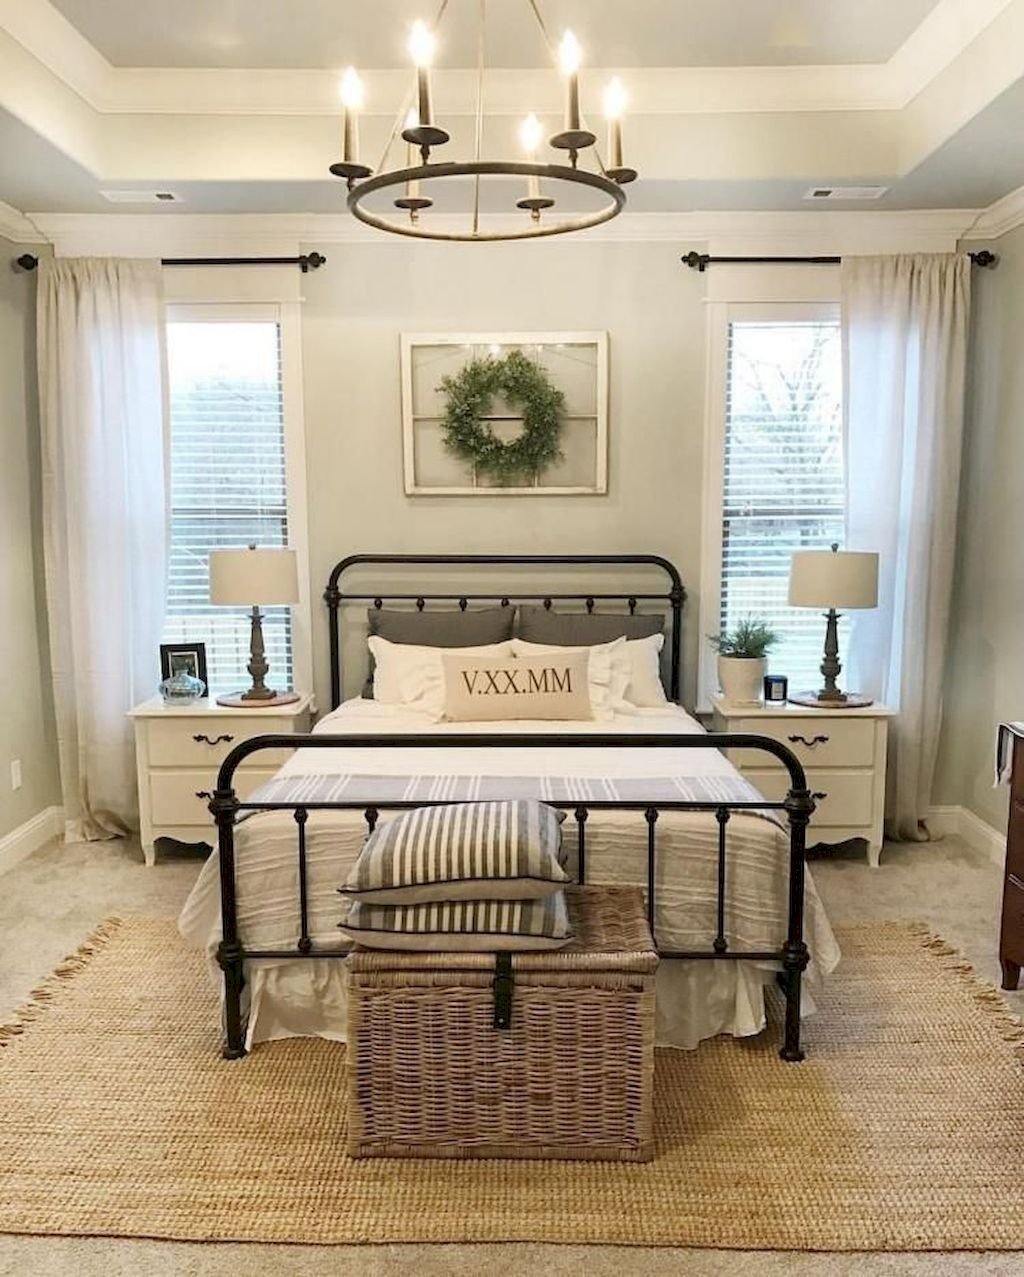 Pin by Johnya Earlywine on Earlywine Estates | Bedroom decor, Rustic ...